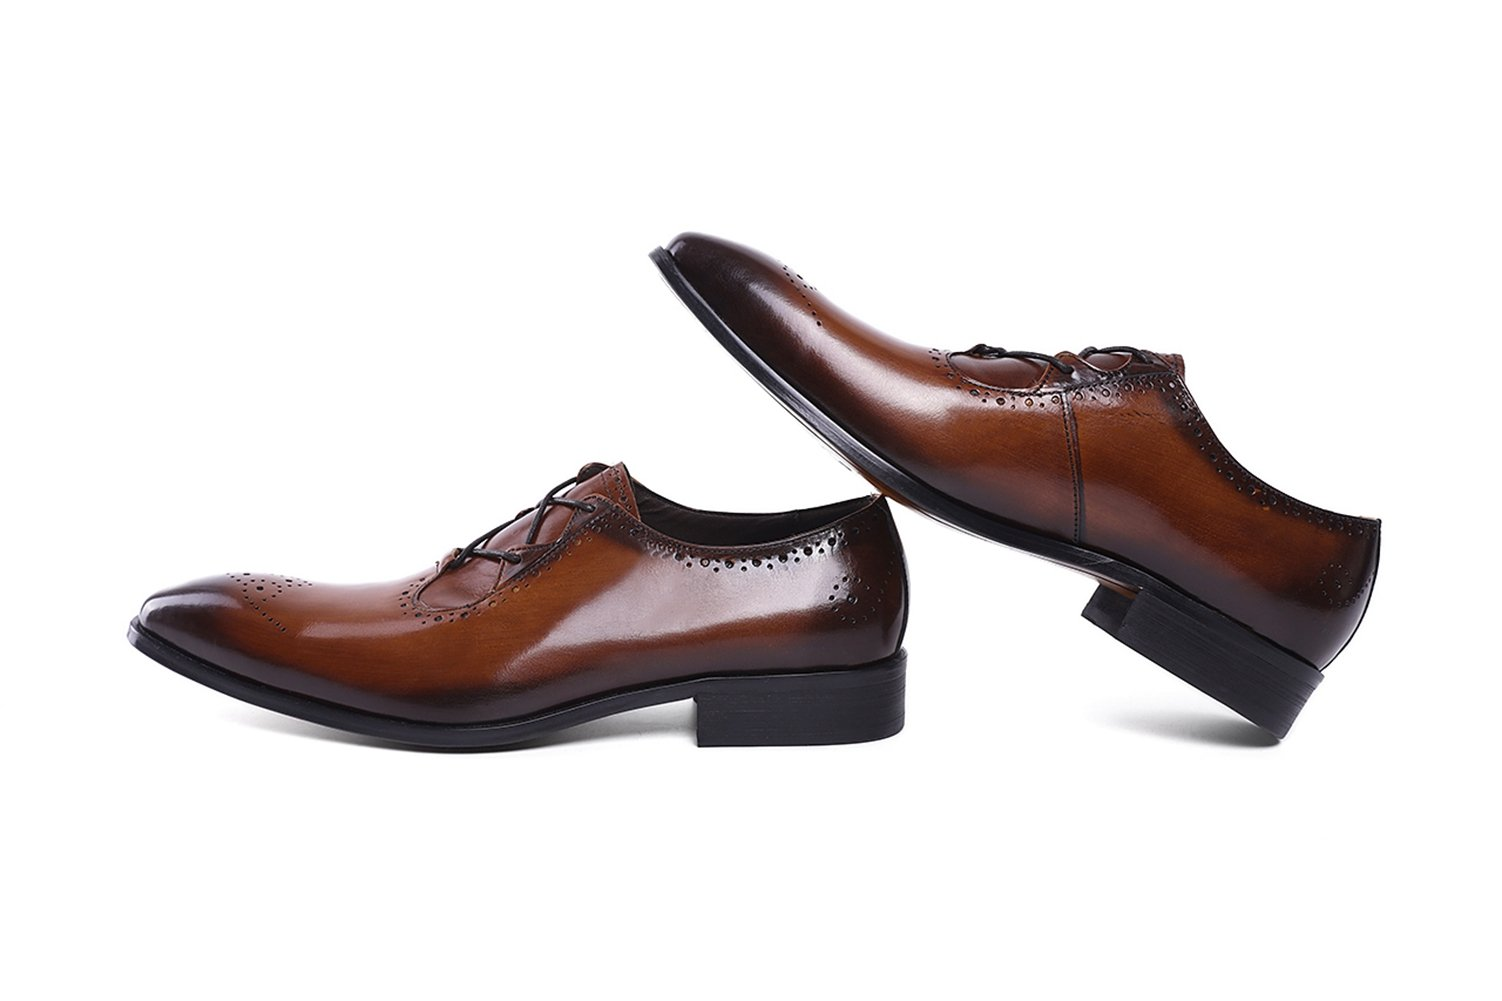 Felix Chu Men's Italian Designer Luxury Perfect Genuine Calf Leather shoes, Brown, 9 D(M) US by Felix Chu (Image #6)